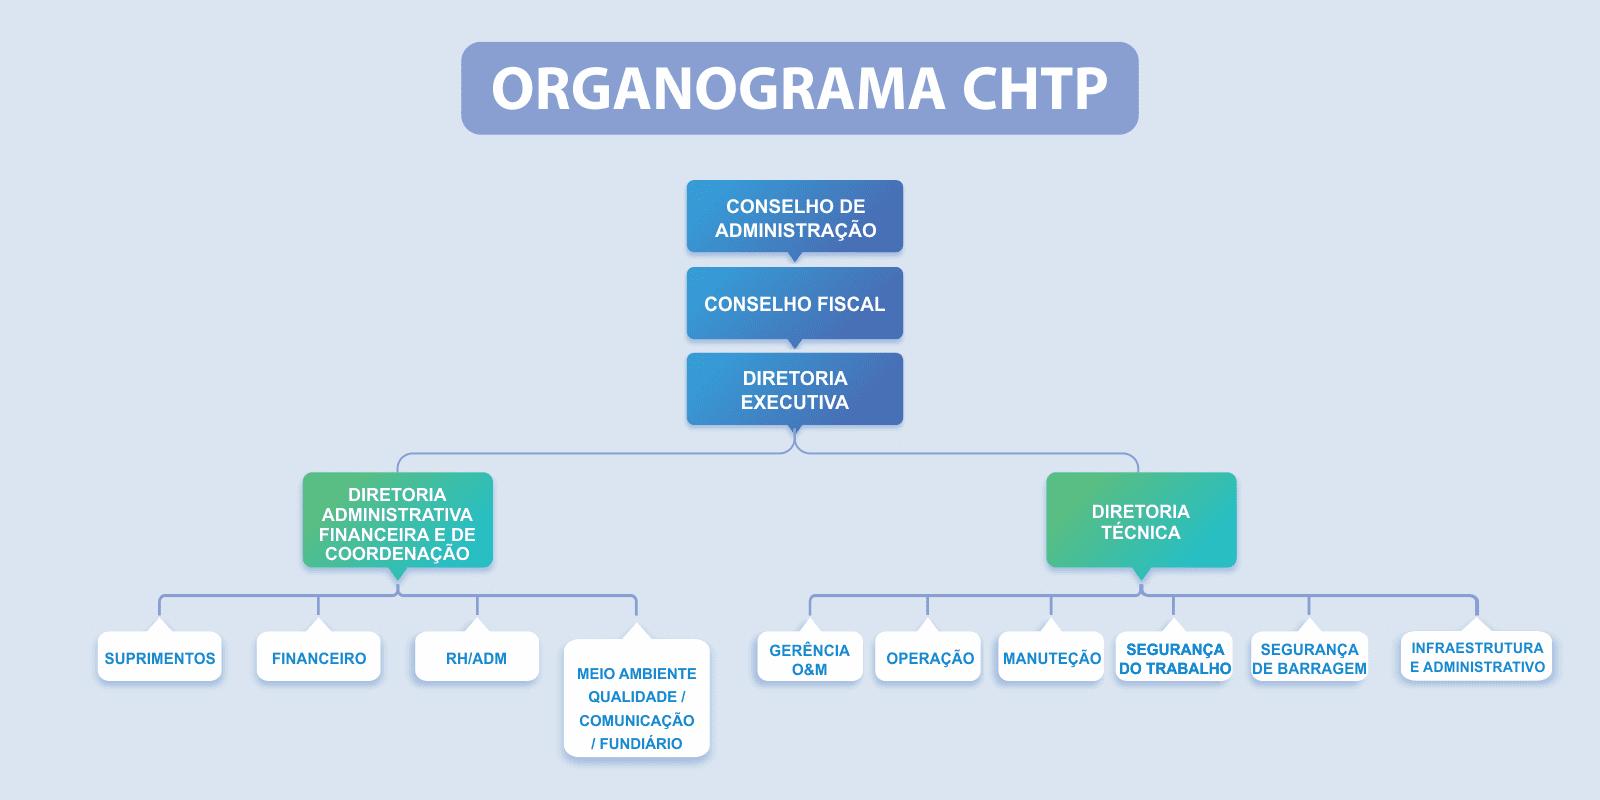 Organograma CHTP